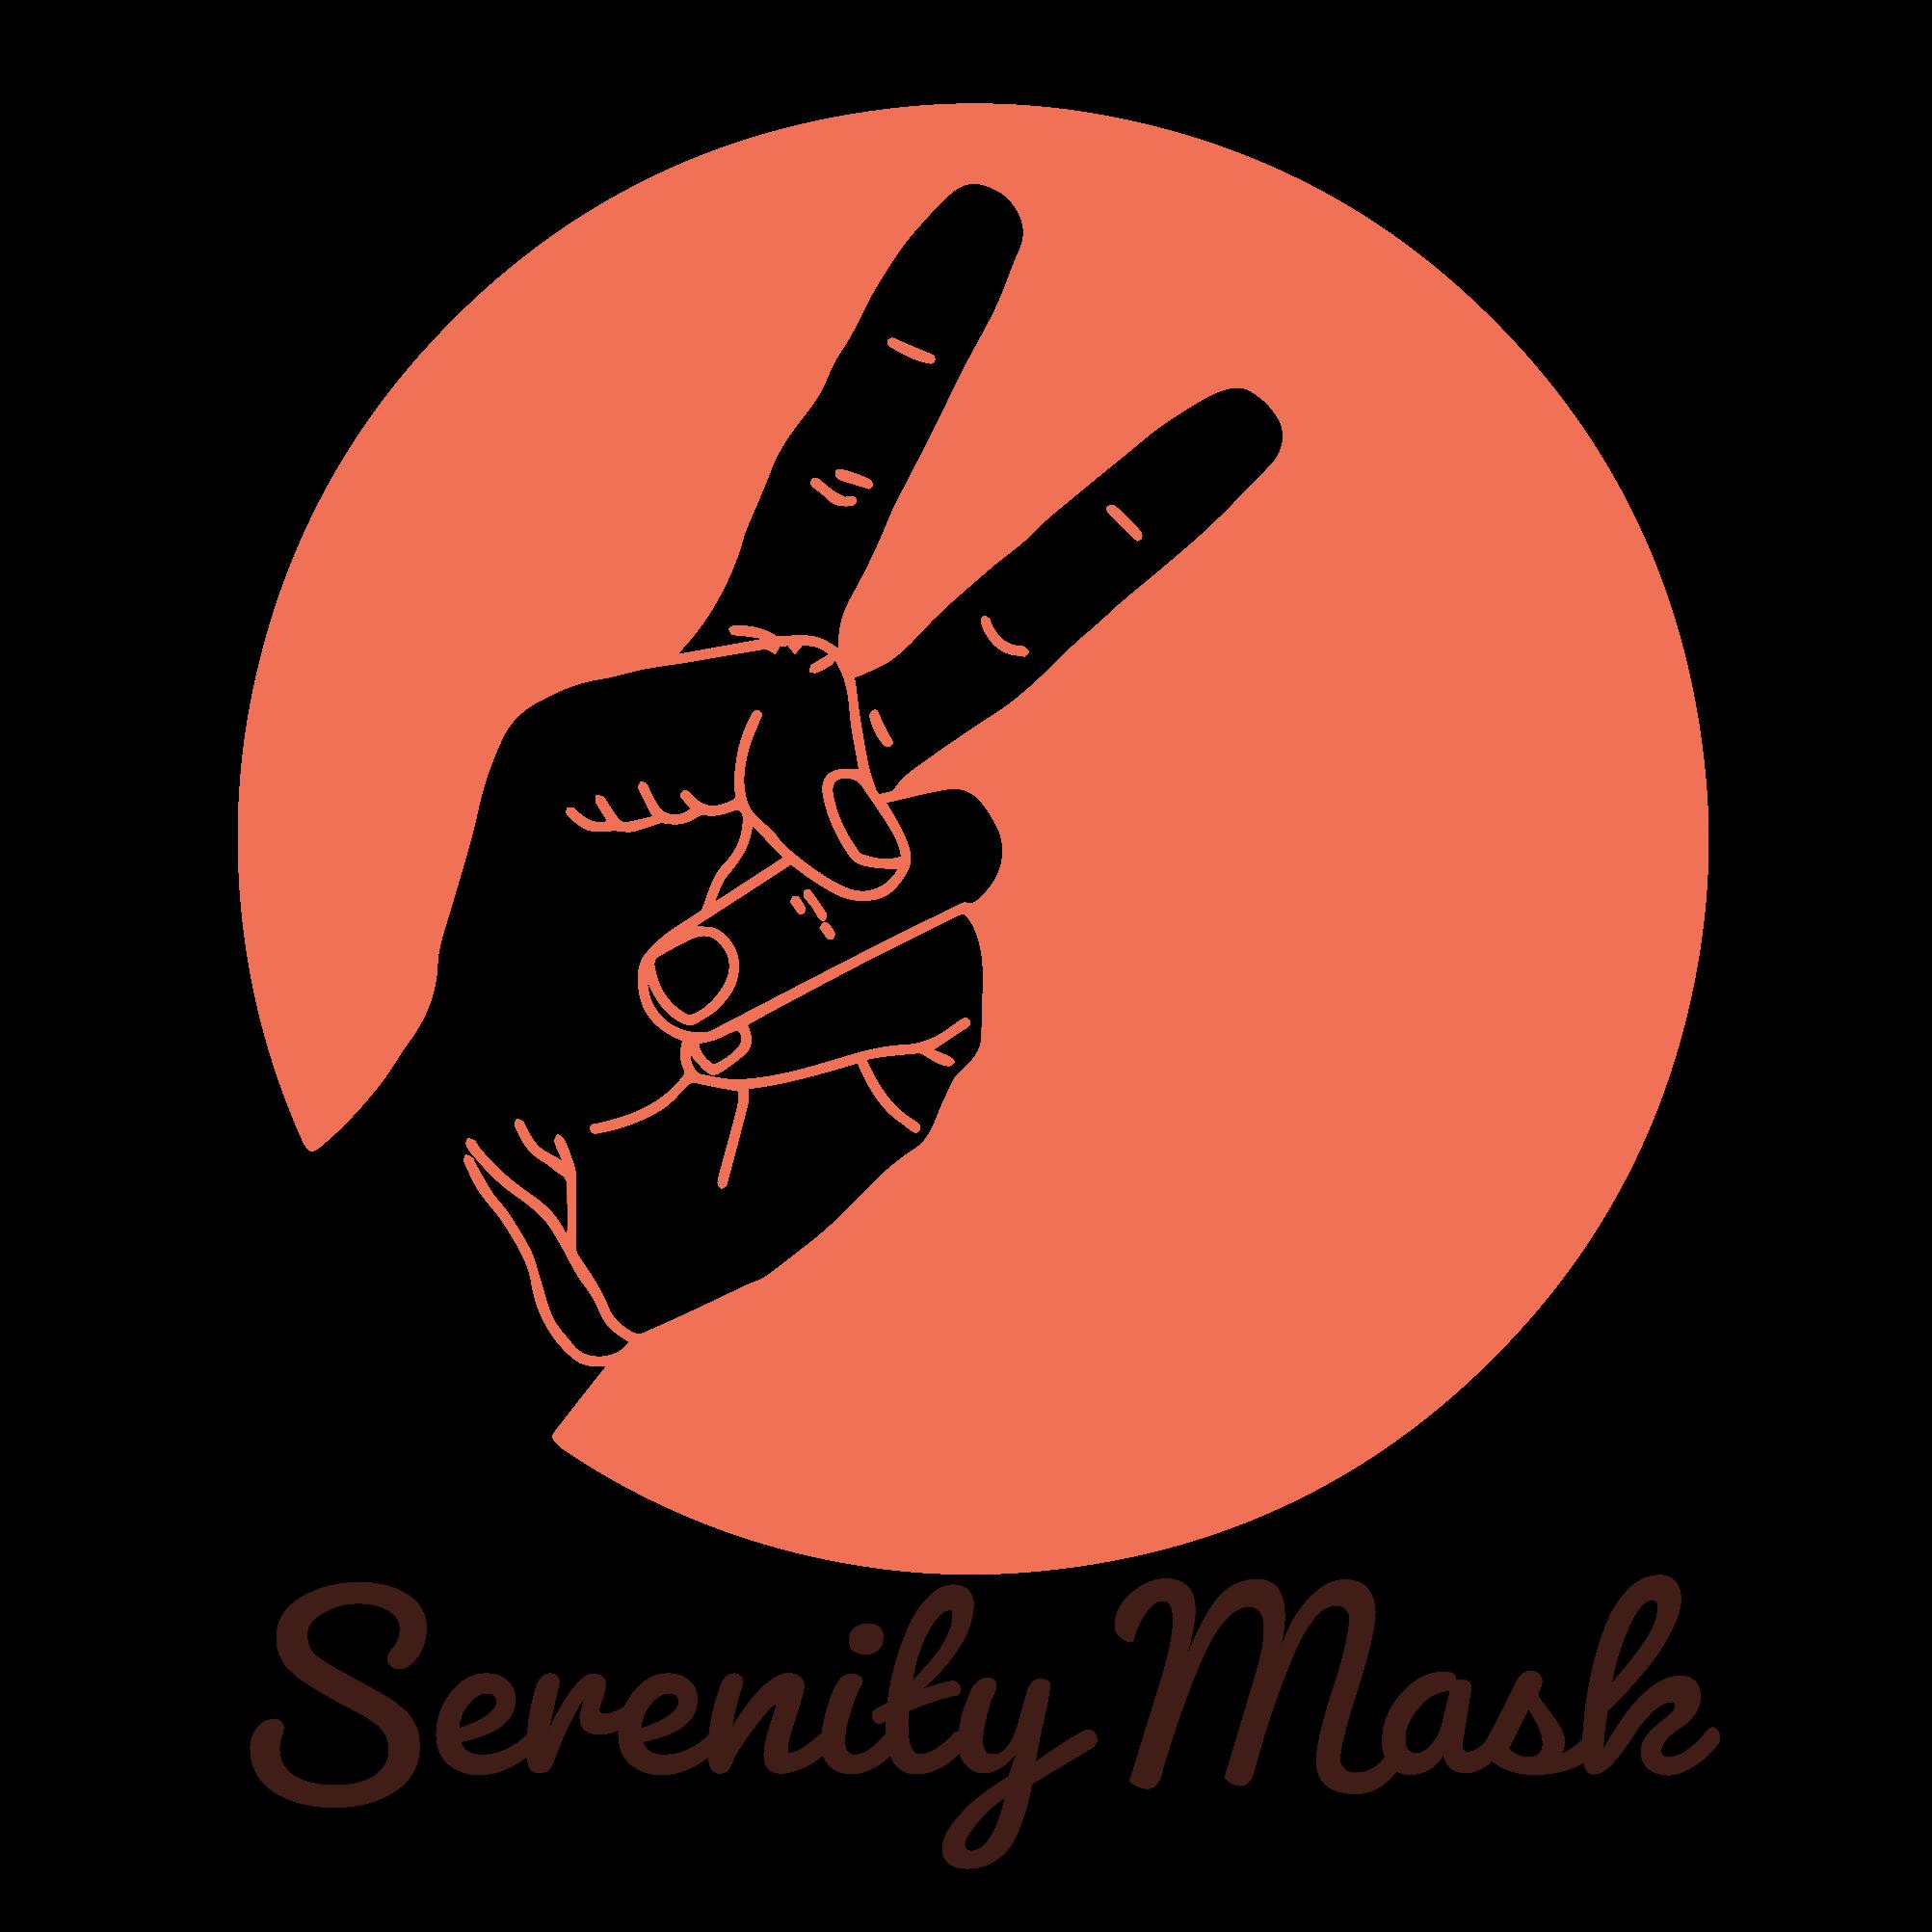 UnMaskedSerenity